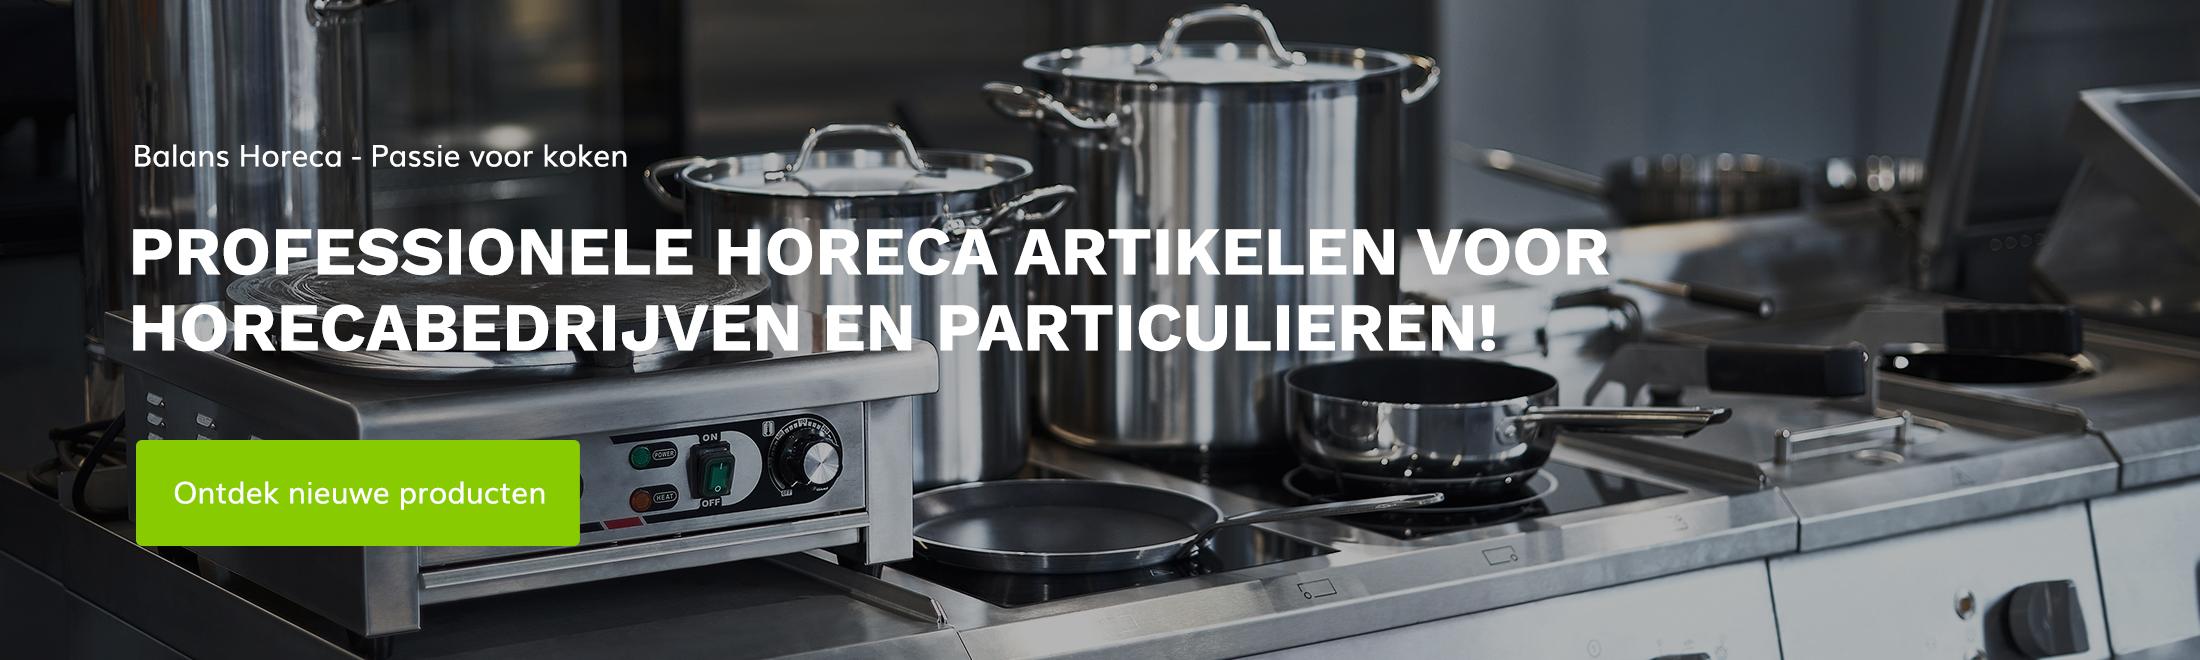 Balans Horca Nieuwe artikelen